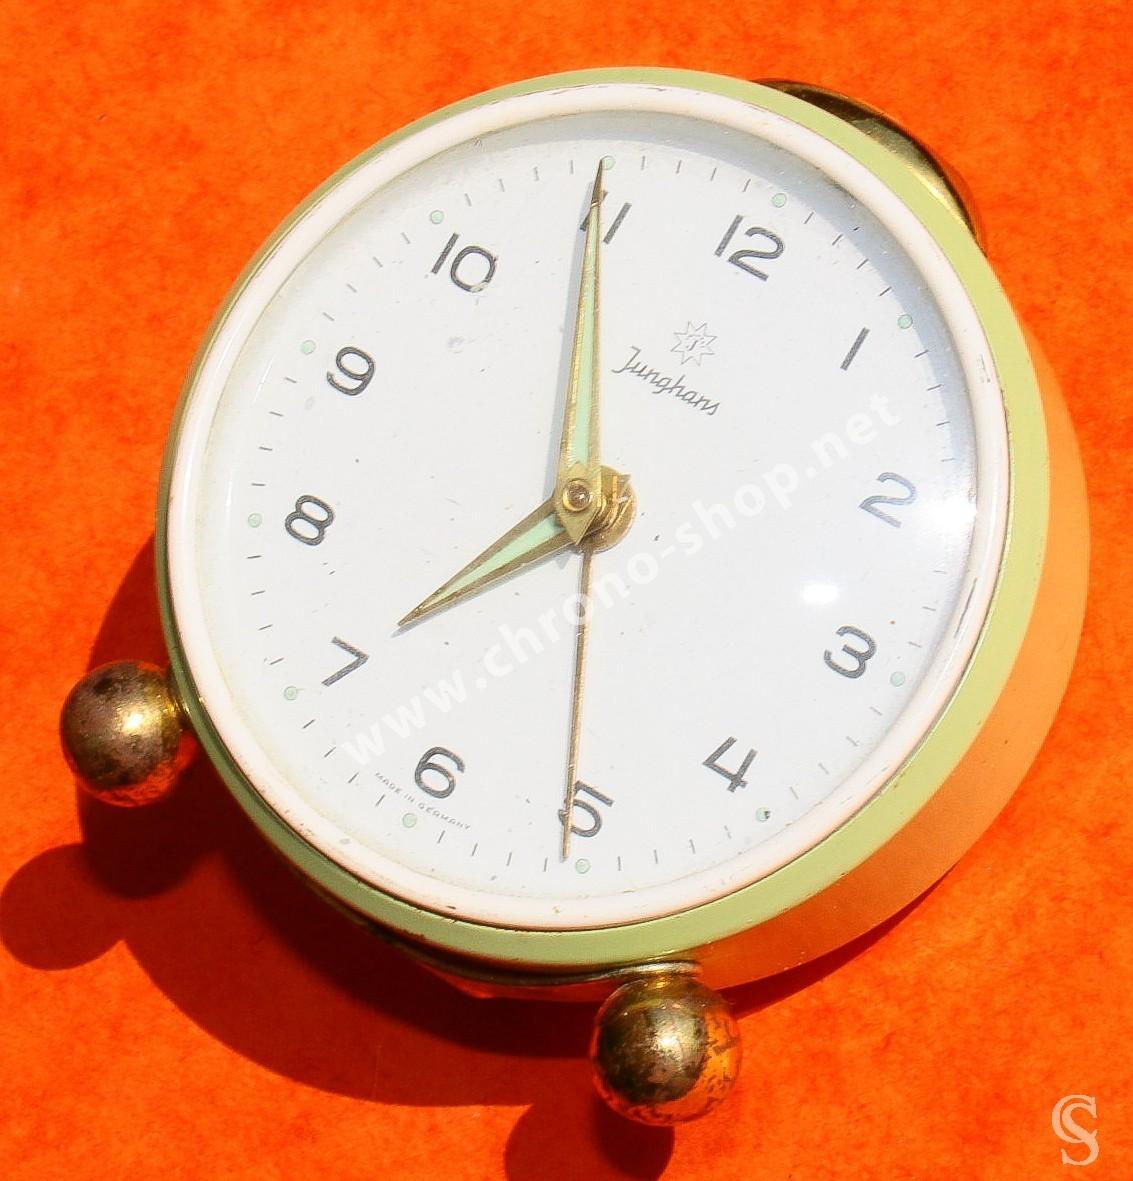 JUNGHANS Germany Alarm Clock Vintage Mantel Shelf Metal ...